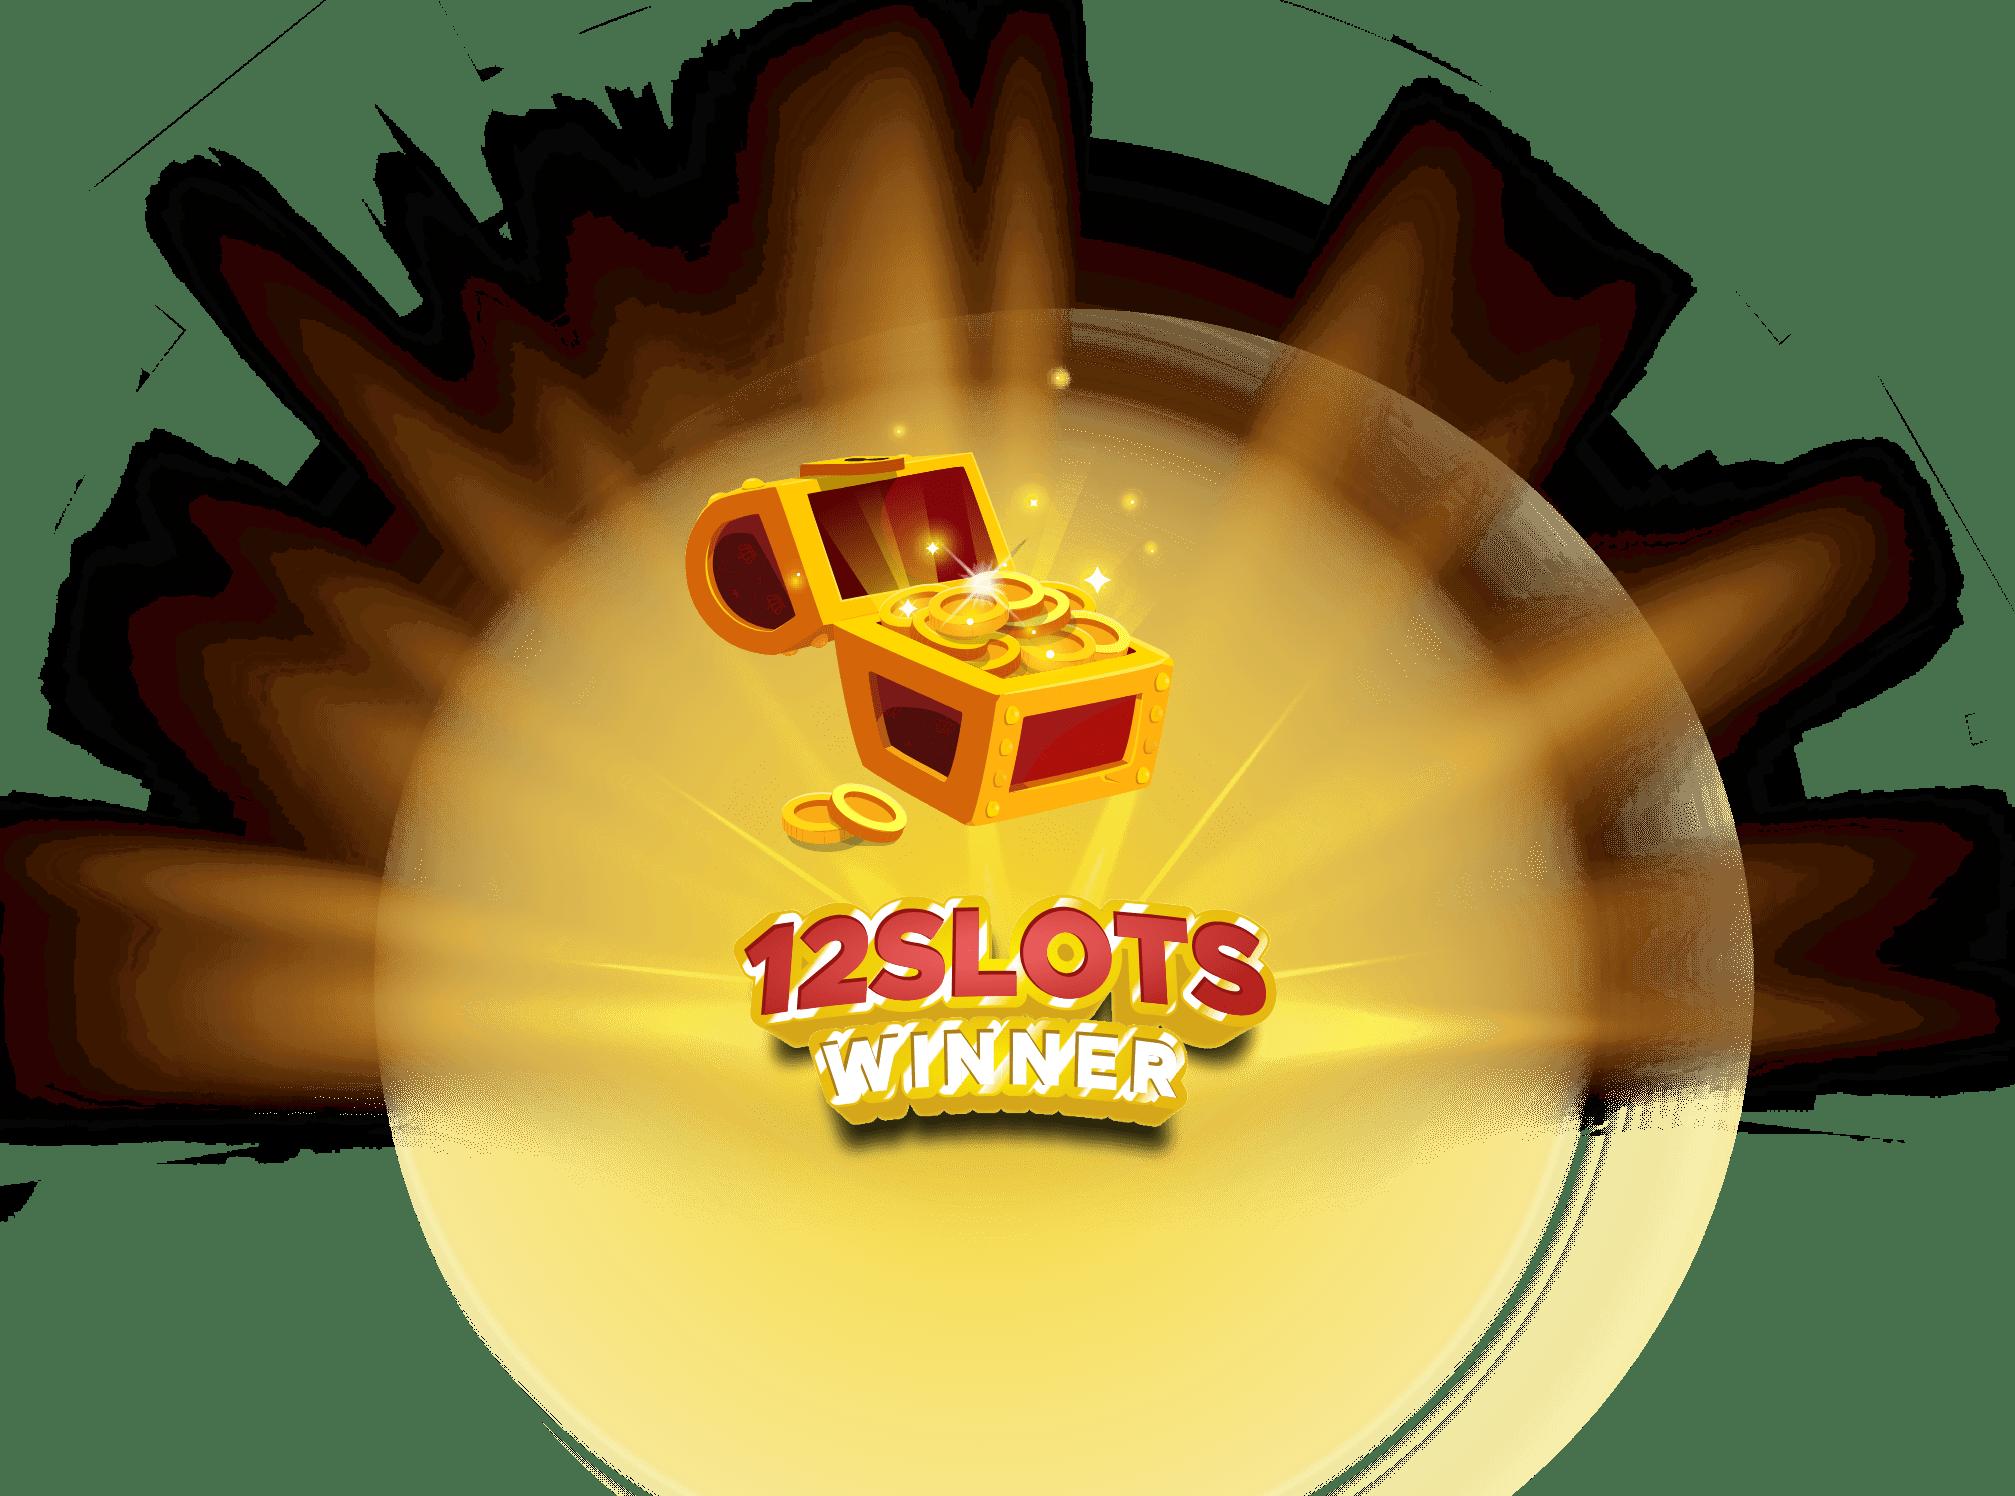 Winner of 12Slot Game Singapore